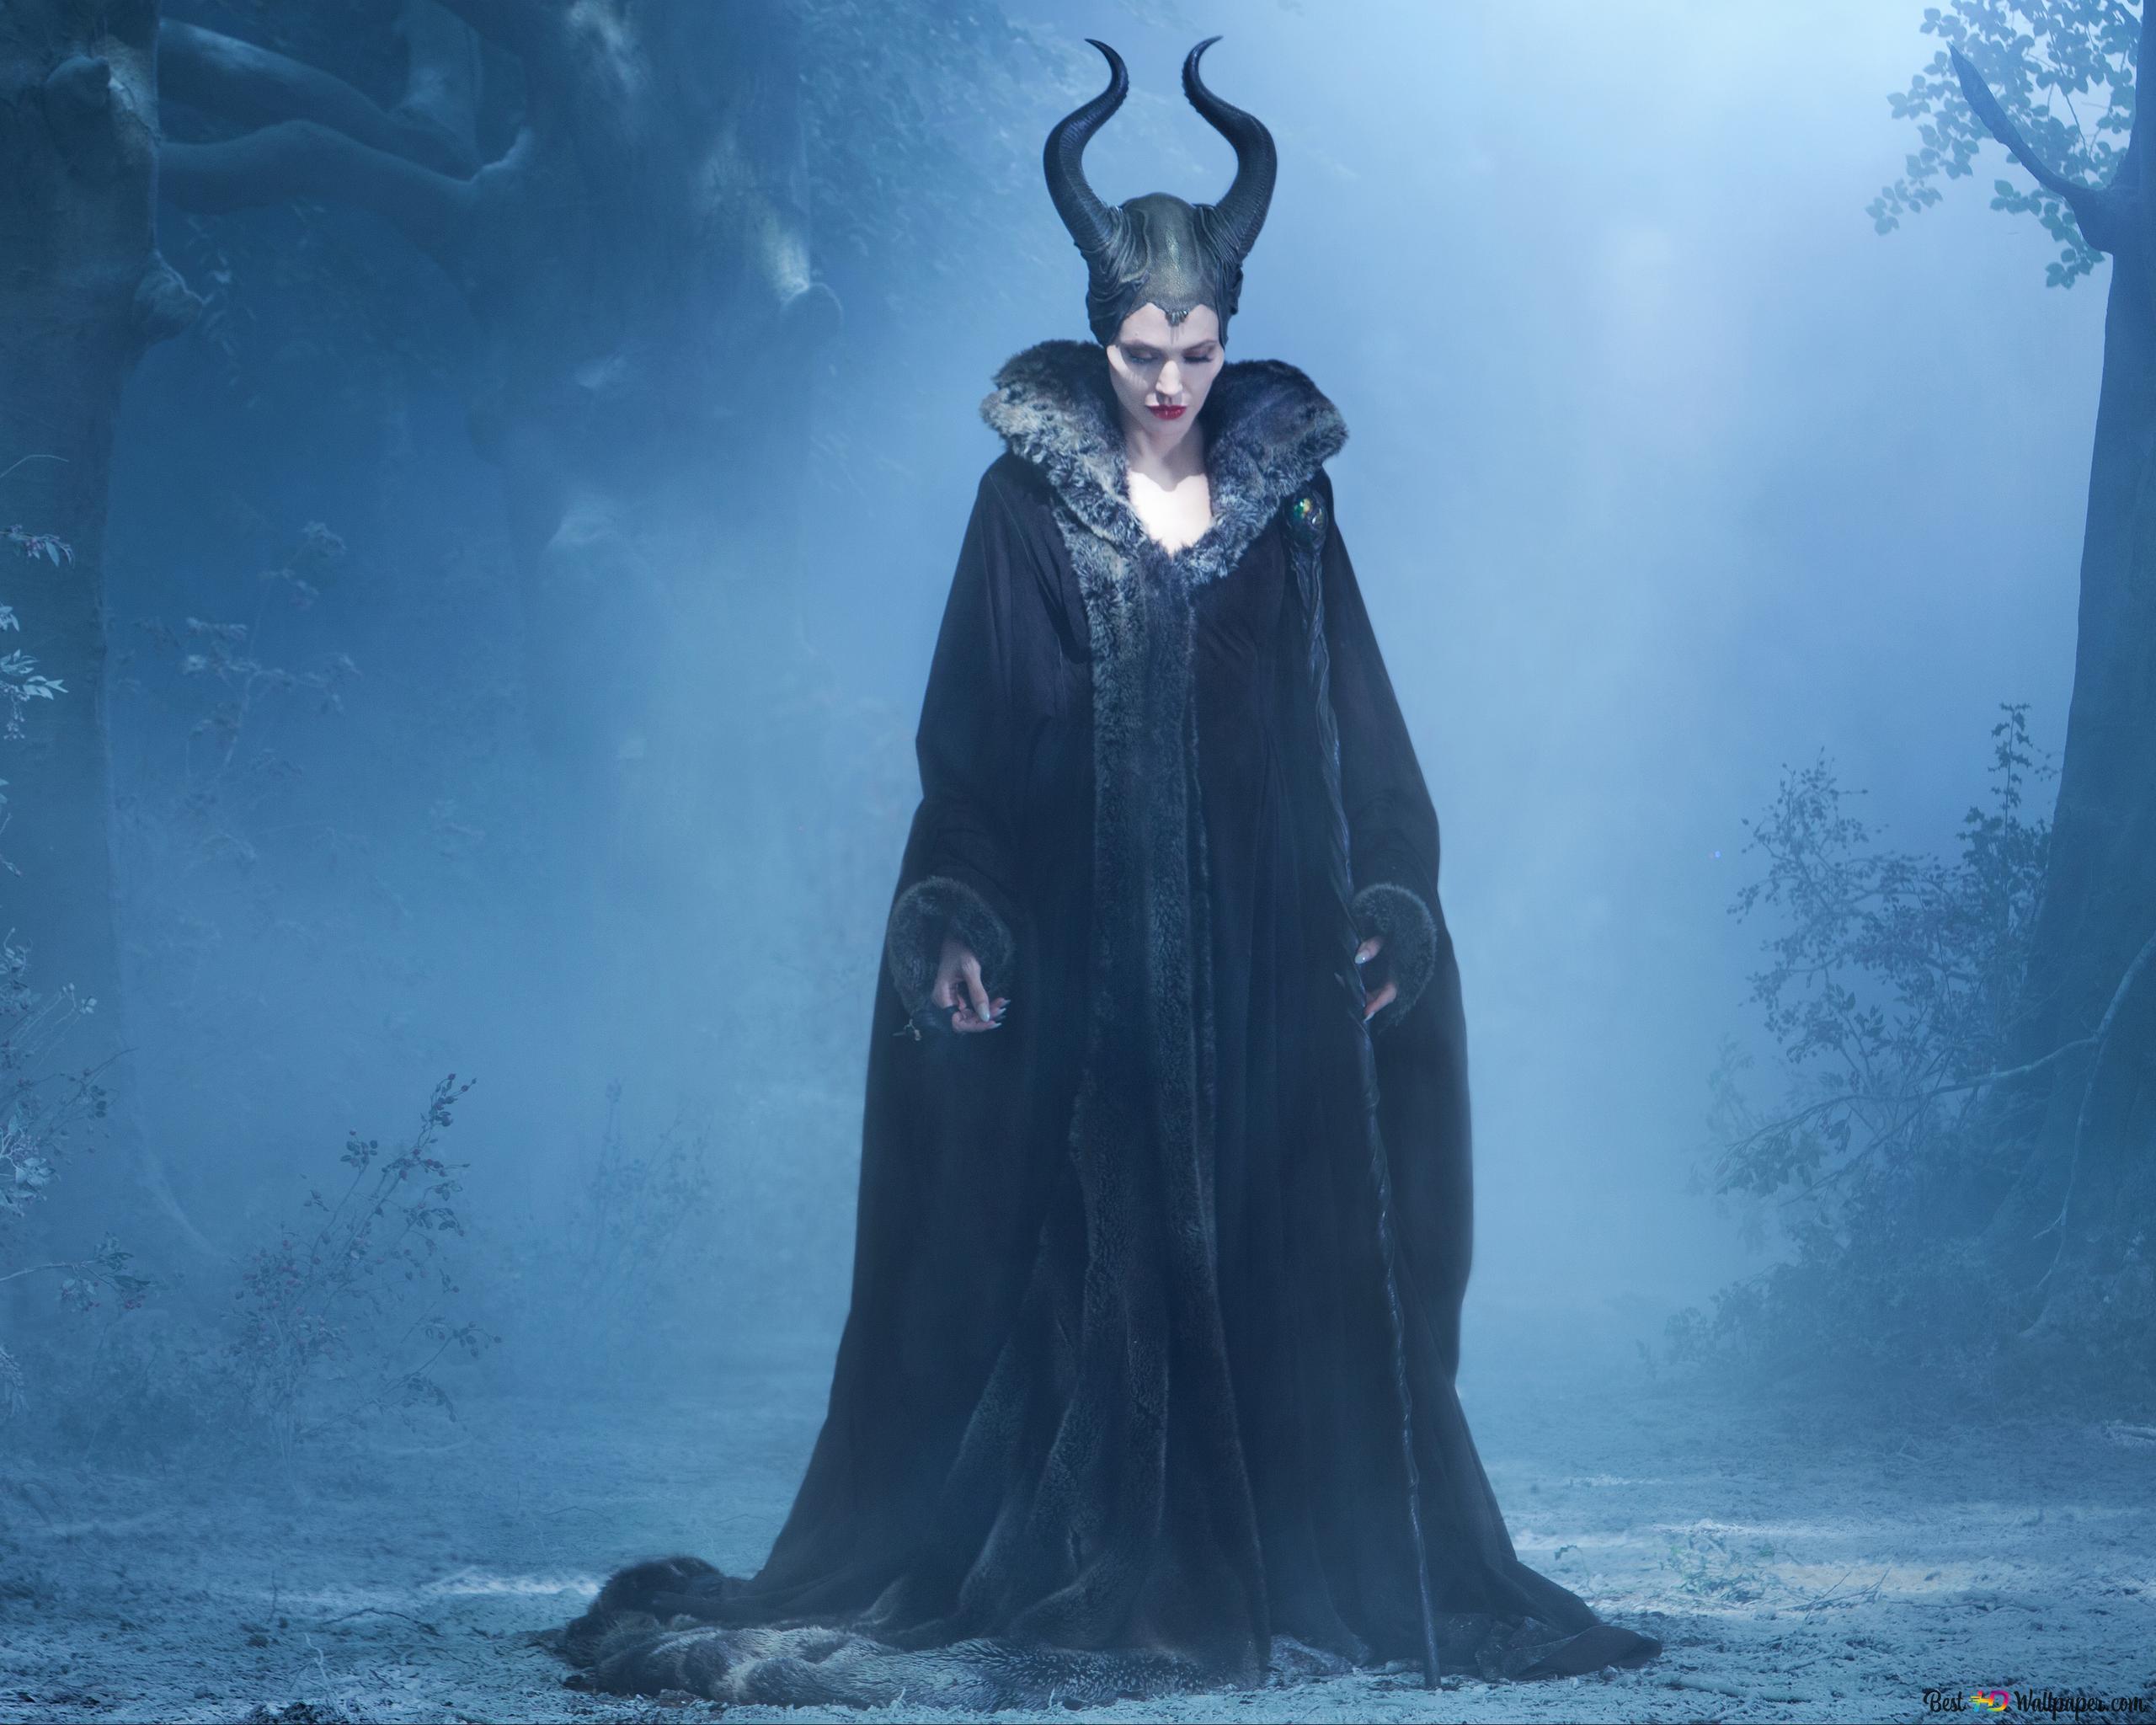 Descargar Fondo De Pantalla Protector Feroz Maleficent Hd